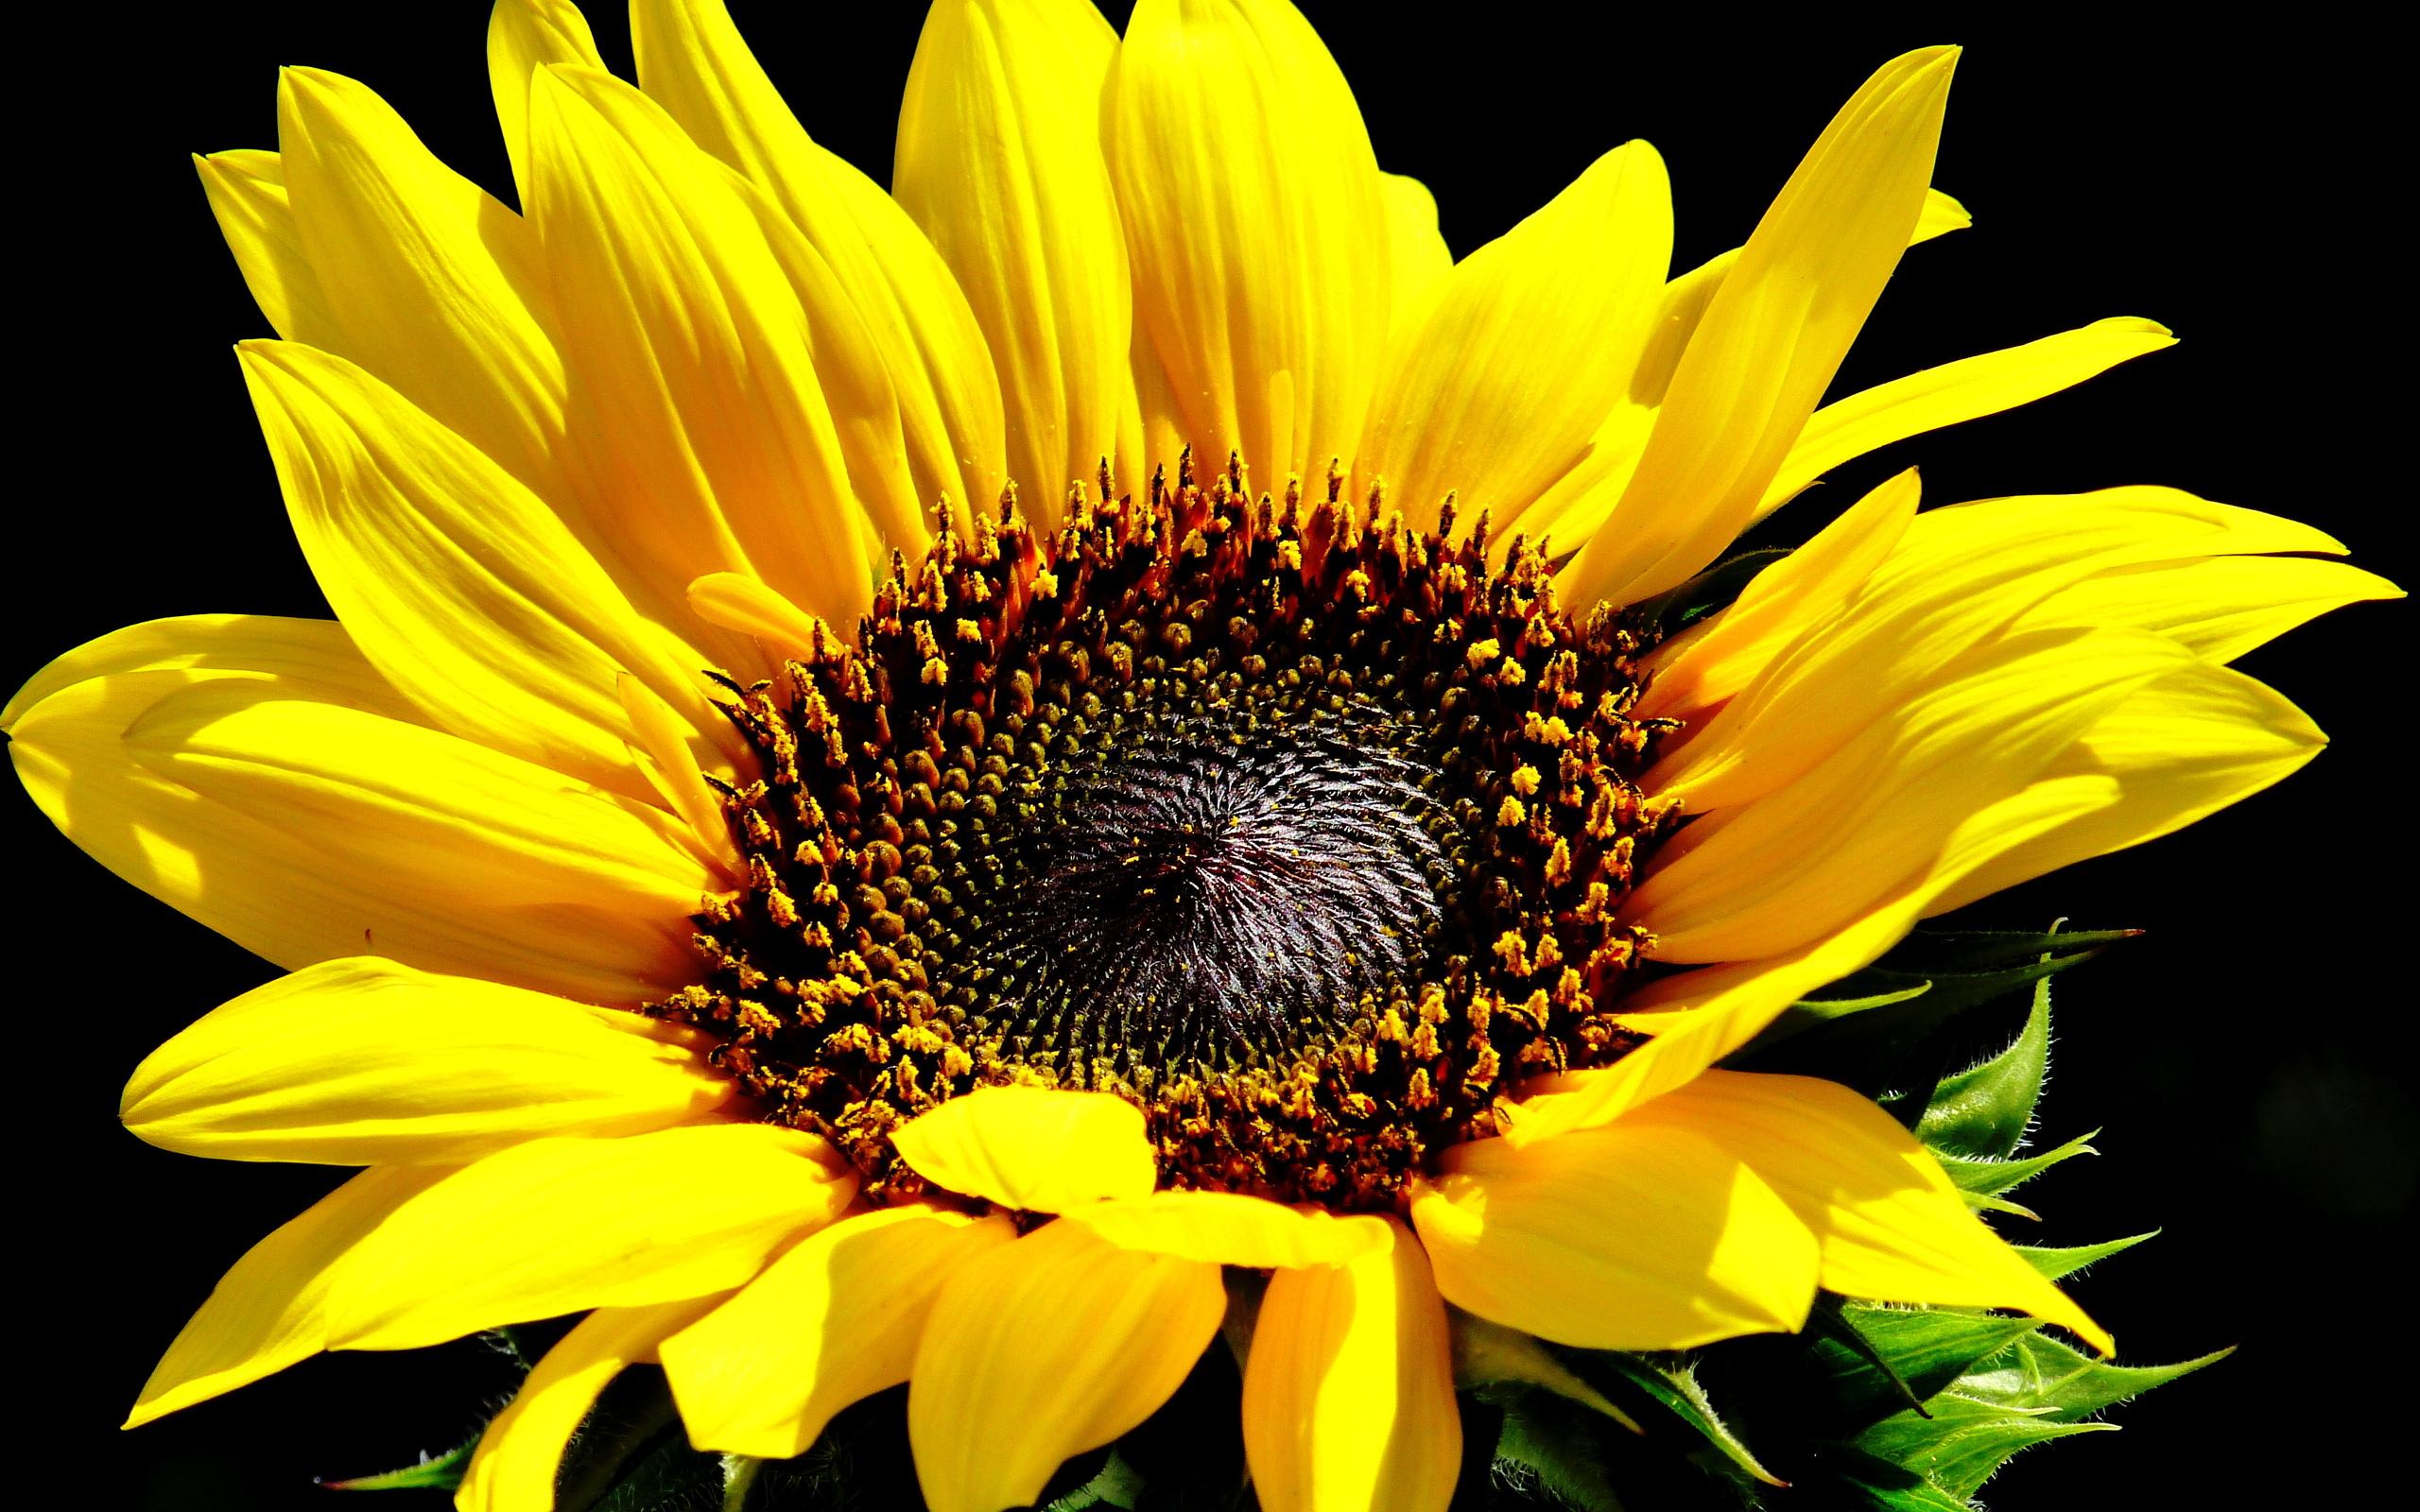 Sunflower Computer Wallpapers, Desktop Backgrounds ...